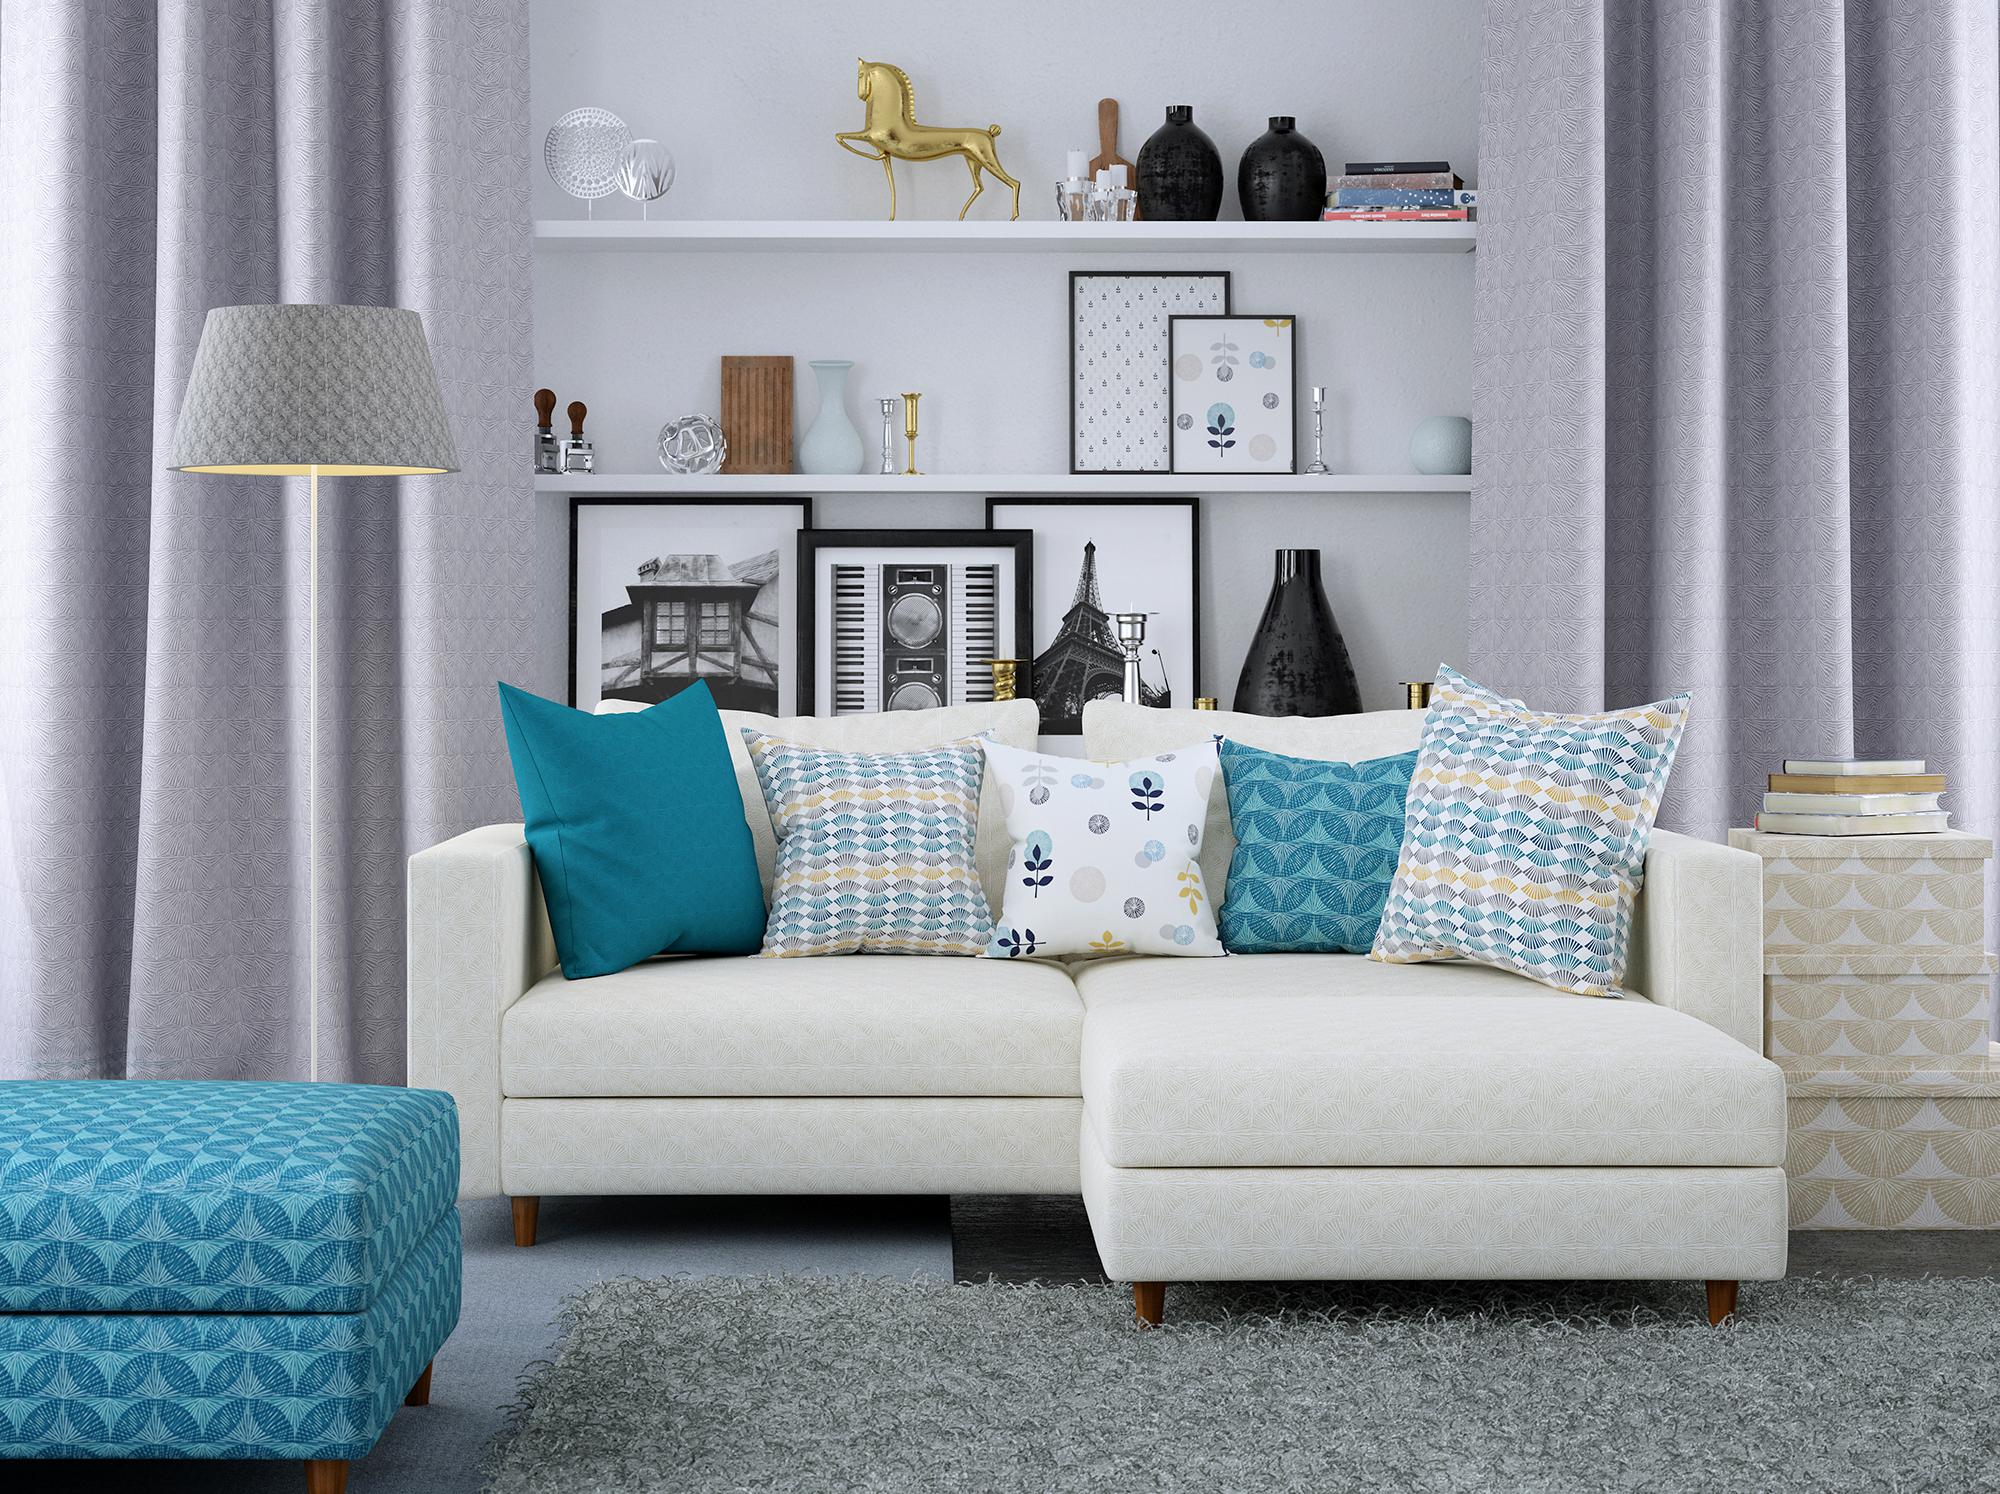 CGI room set of sofa and soft furnishings